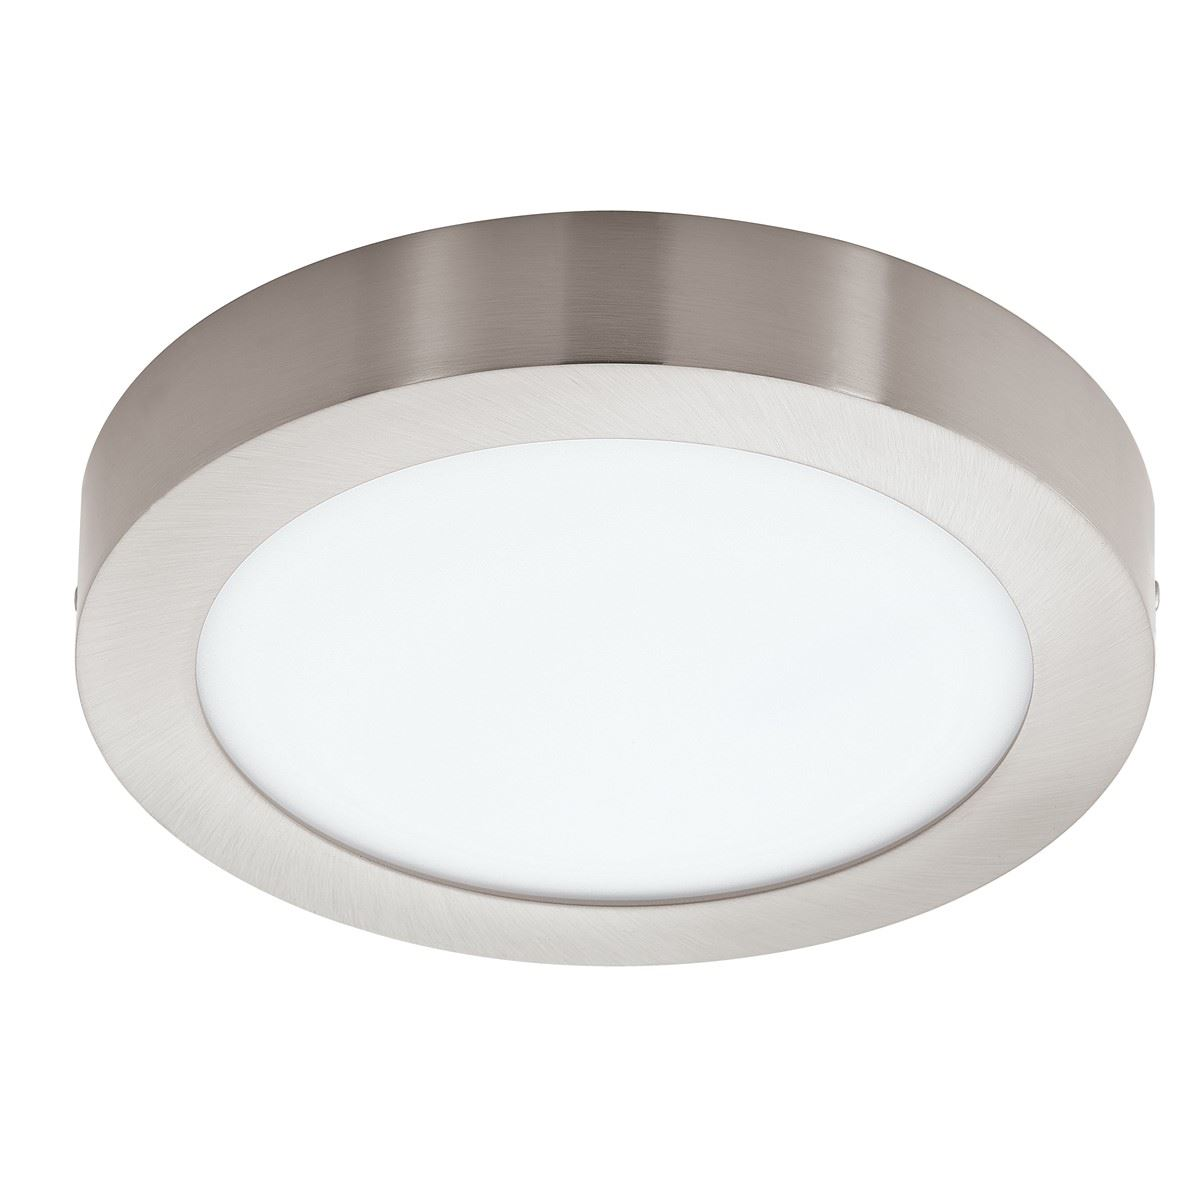 EGLO Fueva Led Surface Mounted Light Dia 225Mm Nickel Plastic White Shade